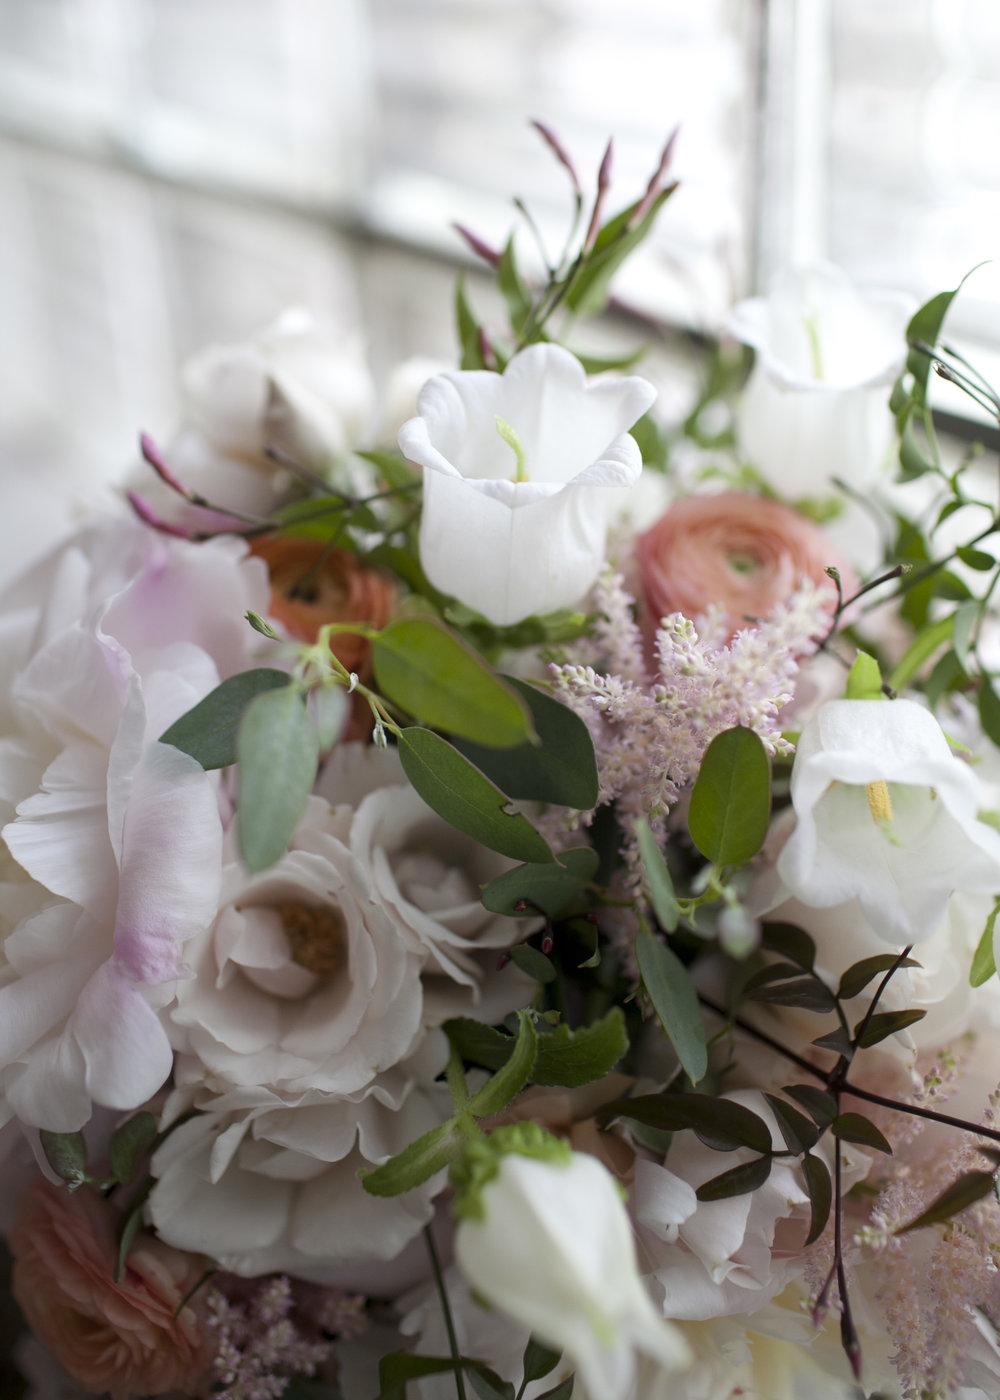 It's the little details that make an arrangement special.